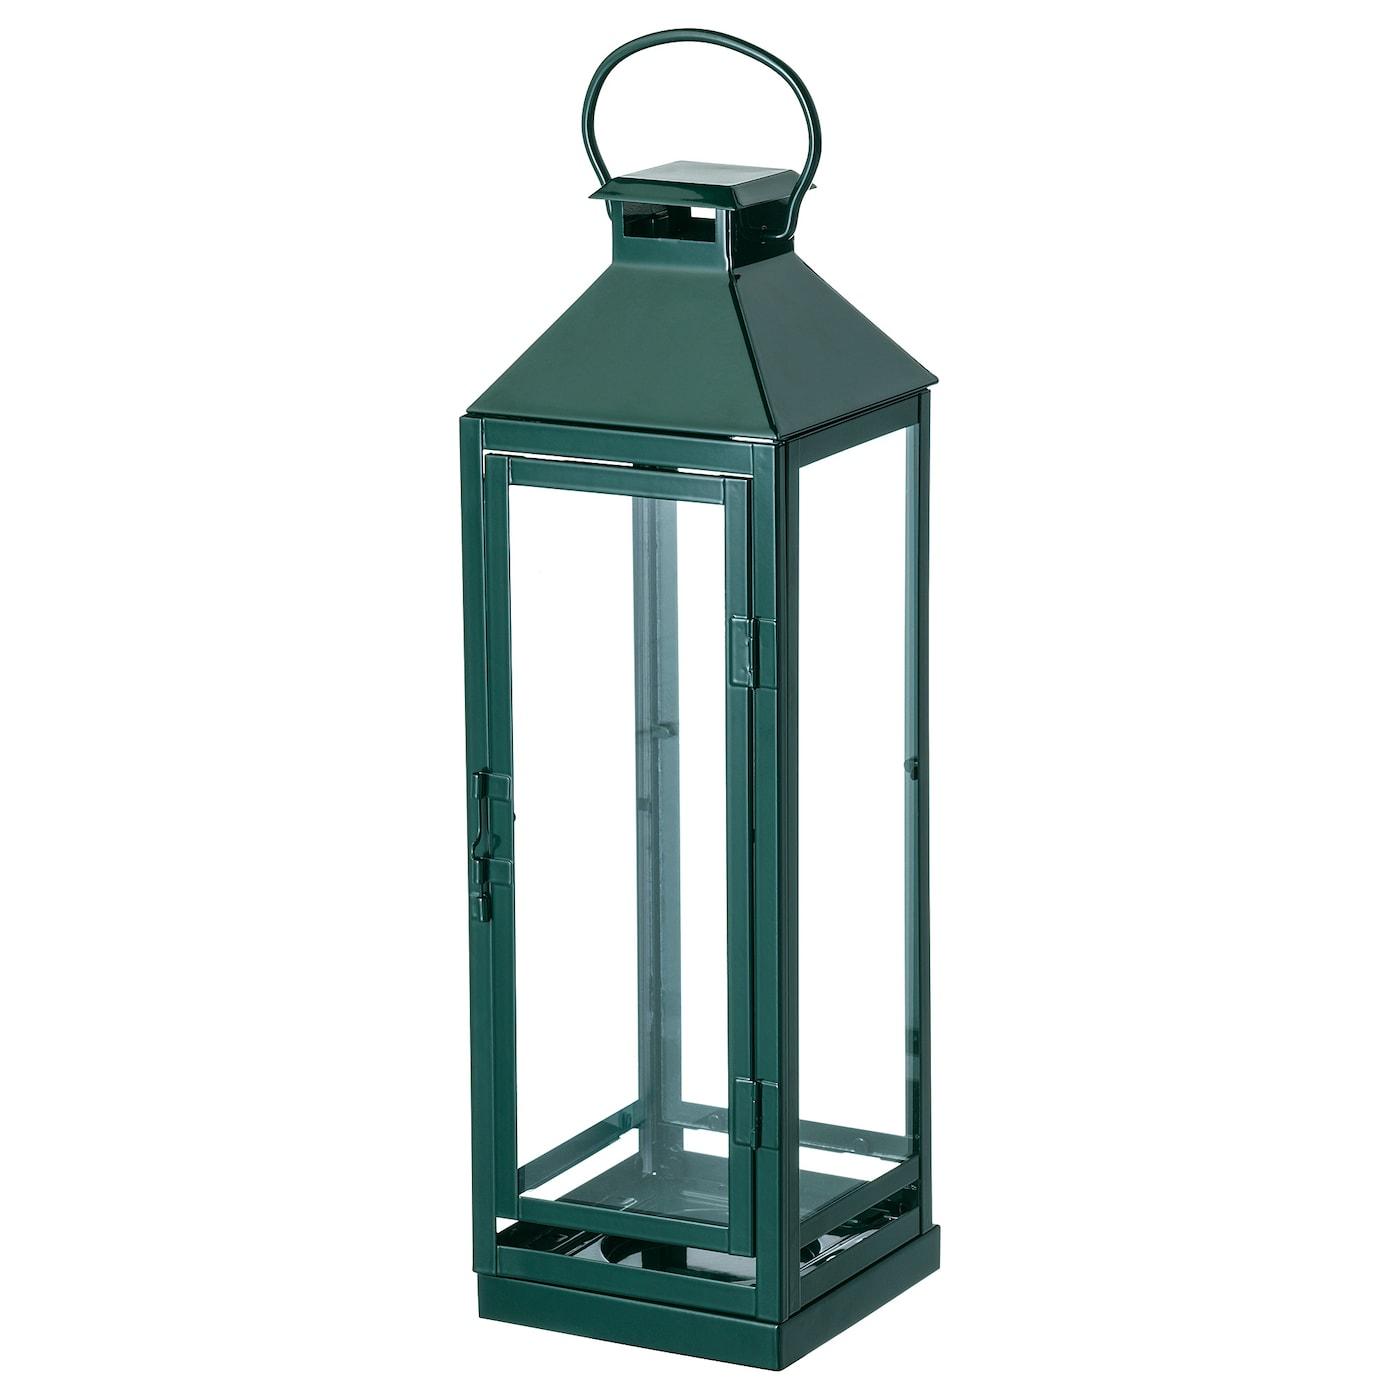 vinter 2018 lanterne pour bougie bloc vert 43 cm ikea. Black Bedroom Furniture Sets. Home Design Ideas